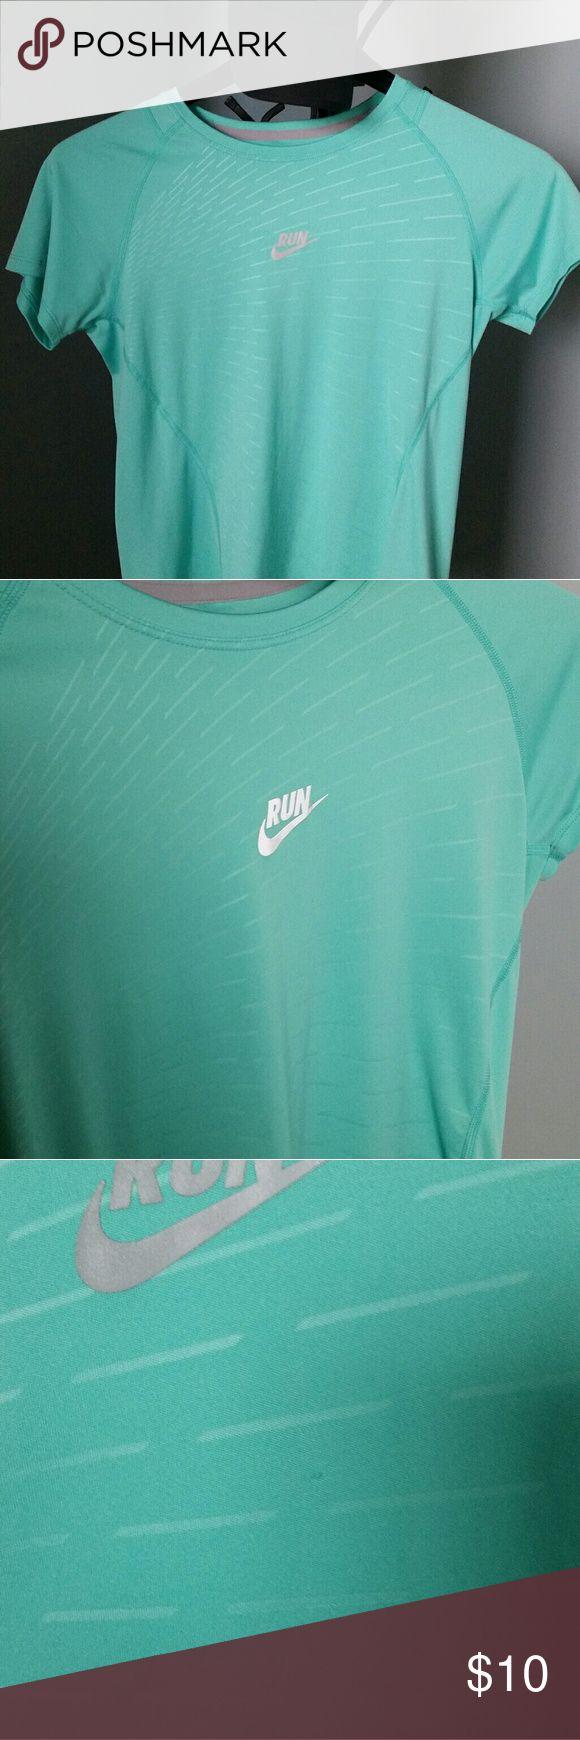 Nike running shirt Teal Nike running shirt with silver Run. Tops Tees - Short Sleeve